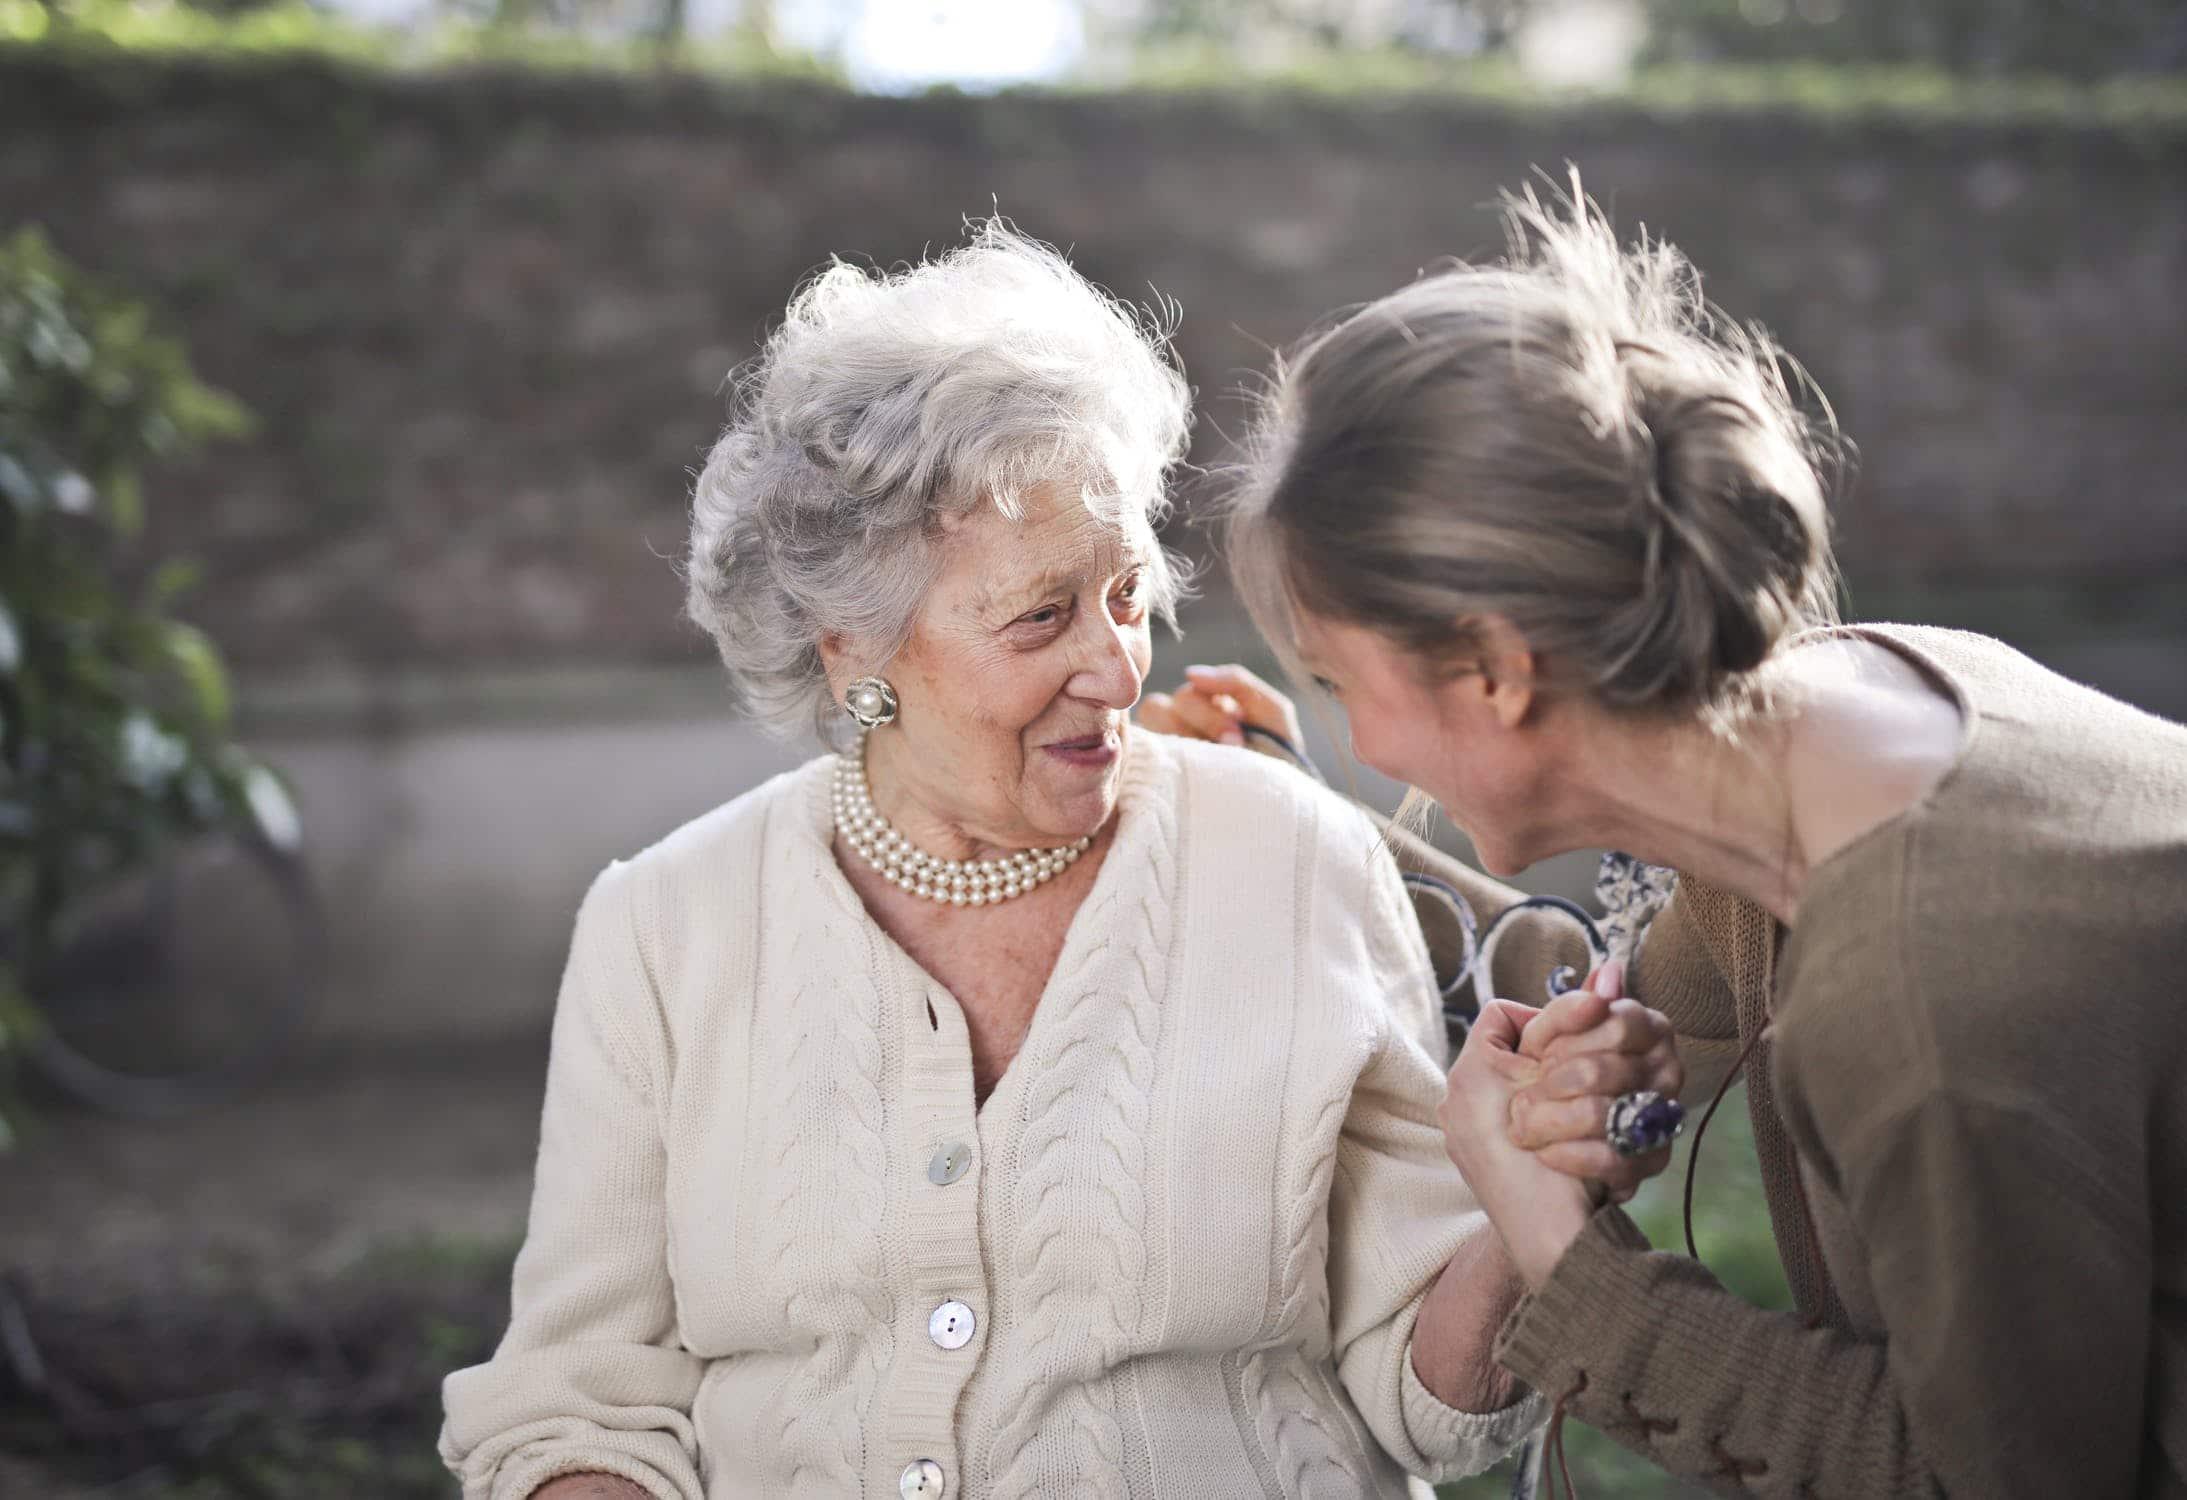 ouderenzorg_glimlach_zon_ouderedame